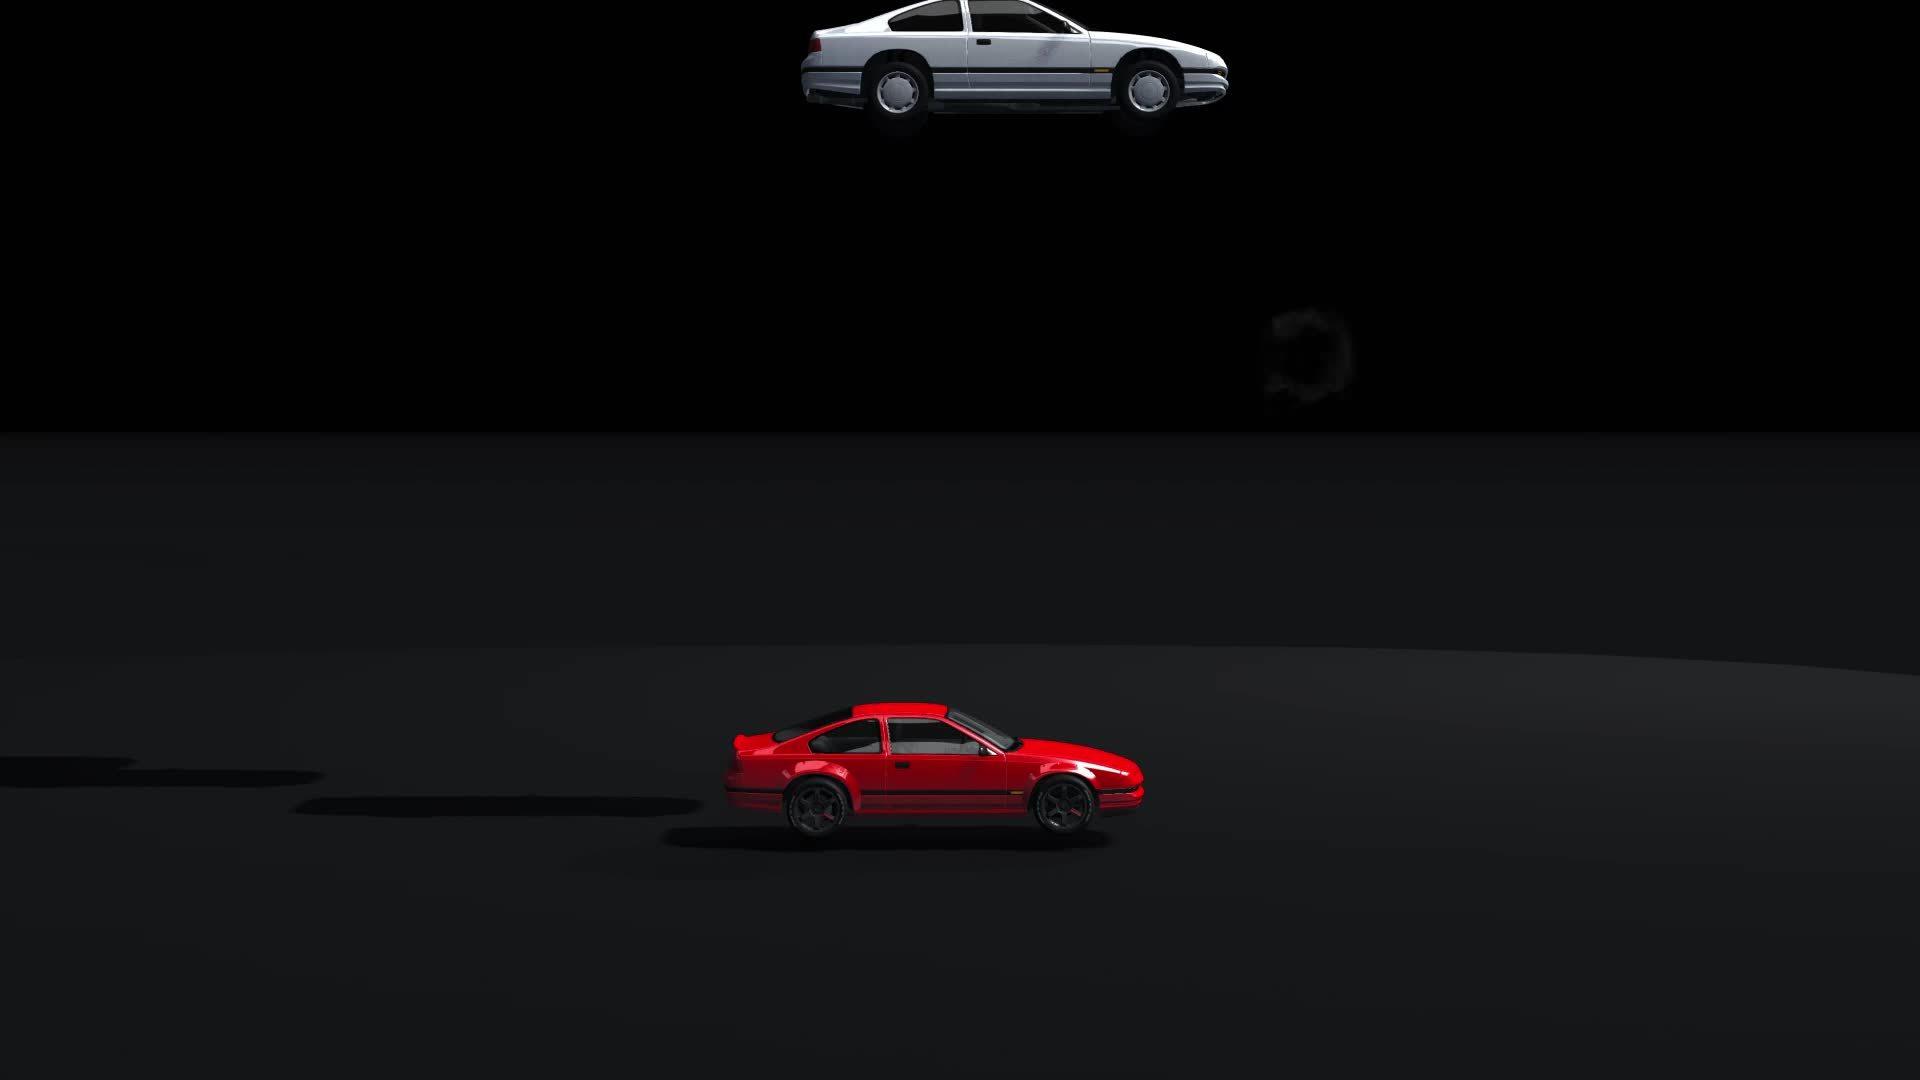 gamephysics, car gamephysics [BeamNG] GIFs